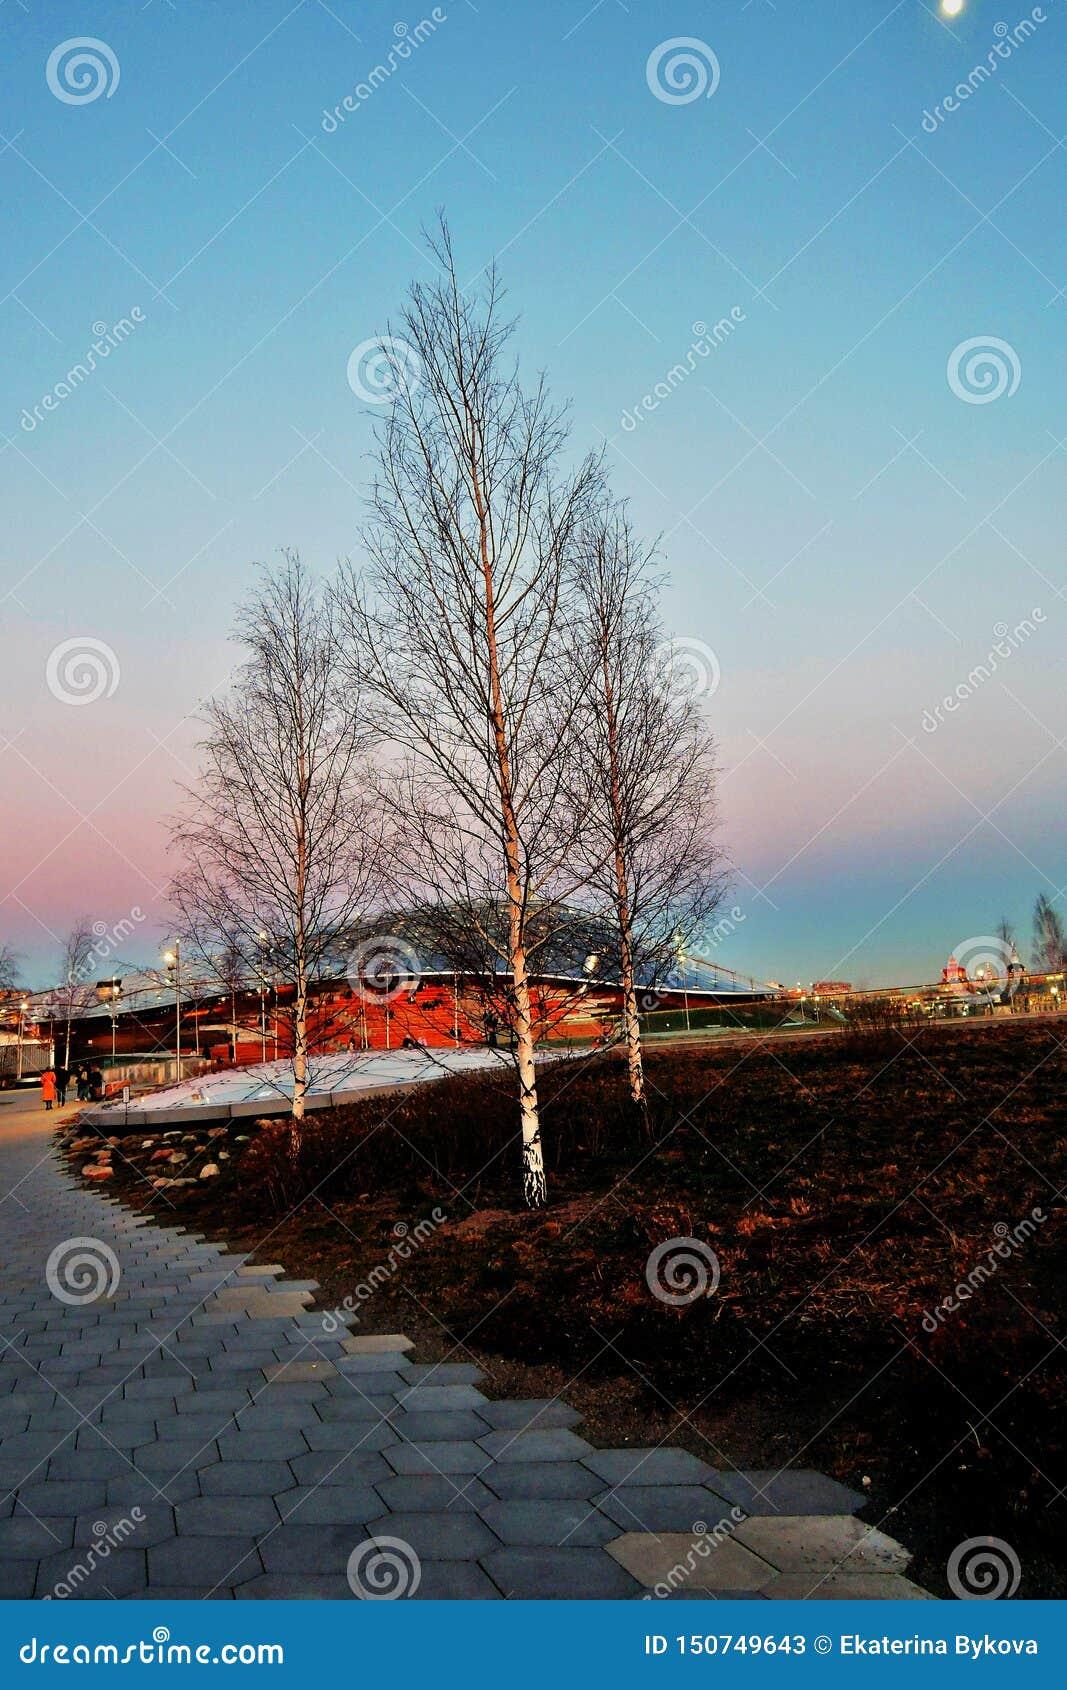 Amphitheater. Architecture of Zaryadye park in Moscow. Popular landmark.